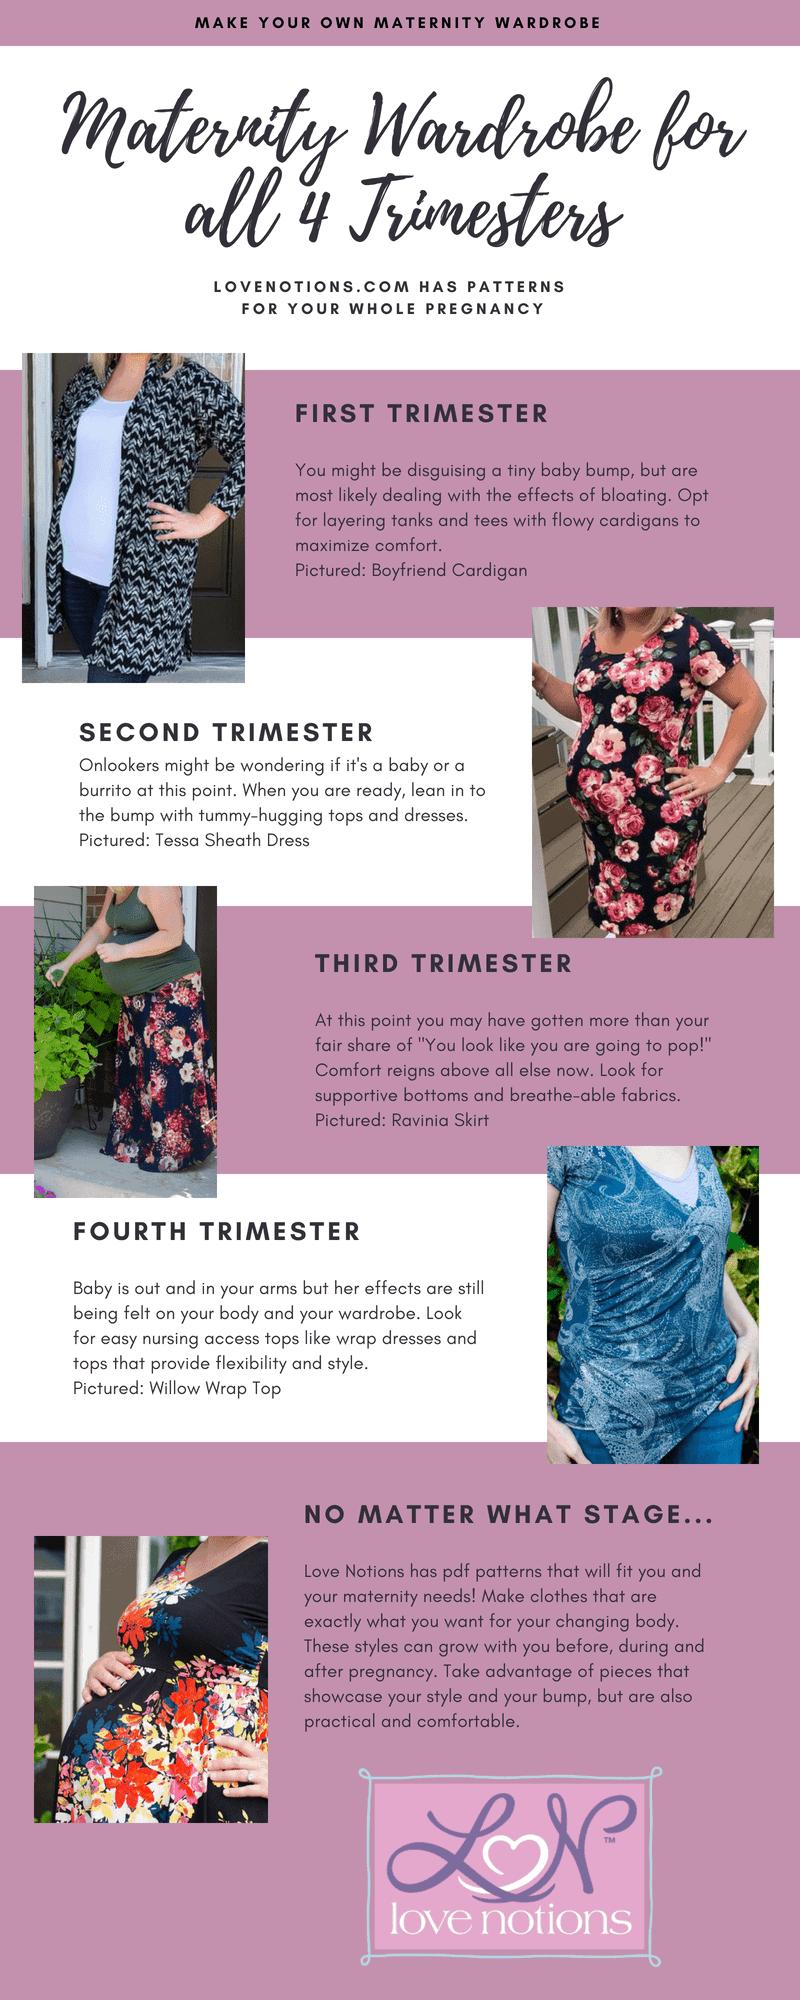 Maternity, Nursing, Maternity Wardrobe